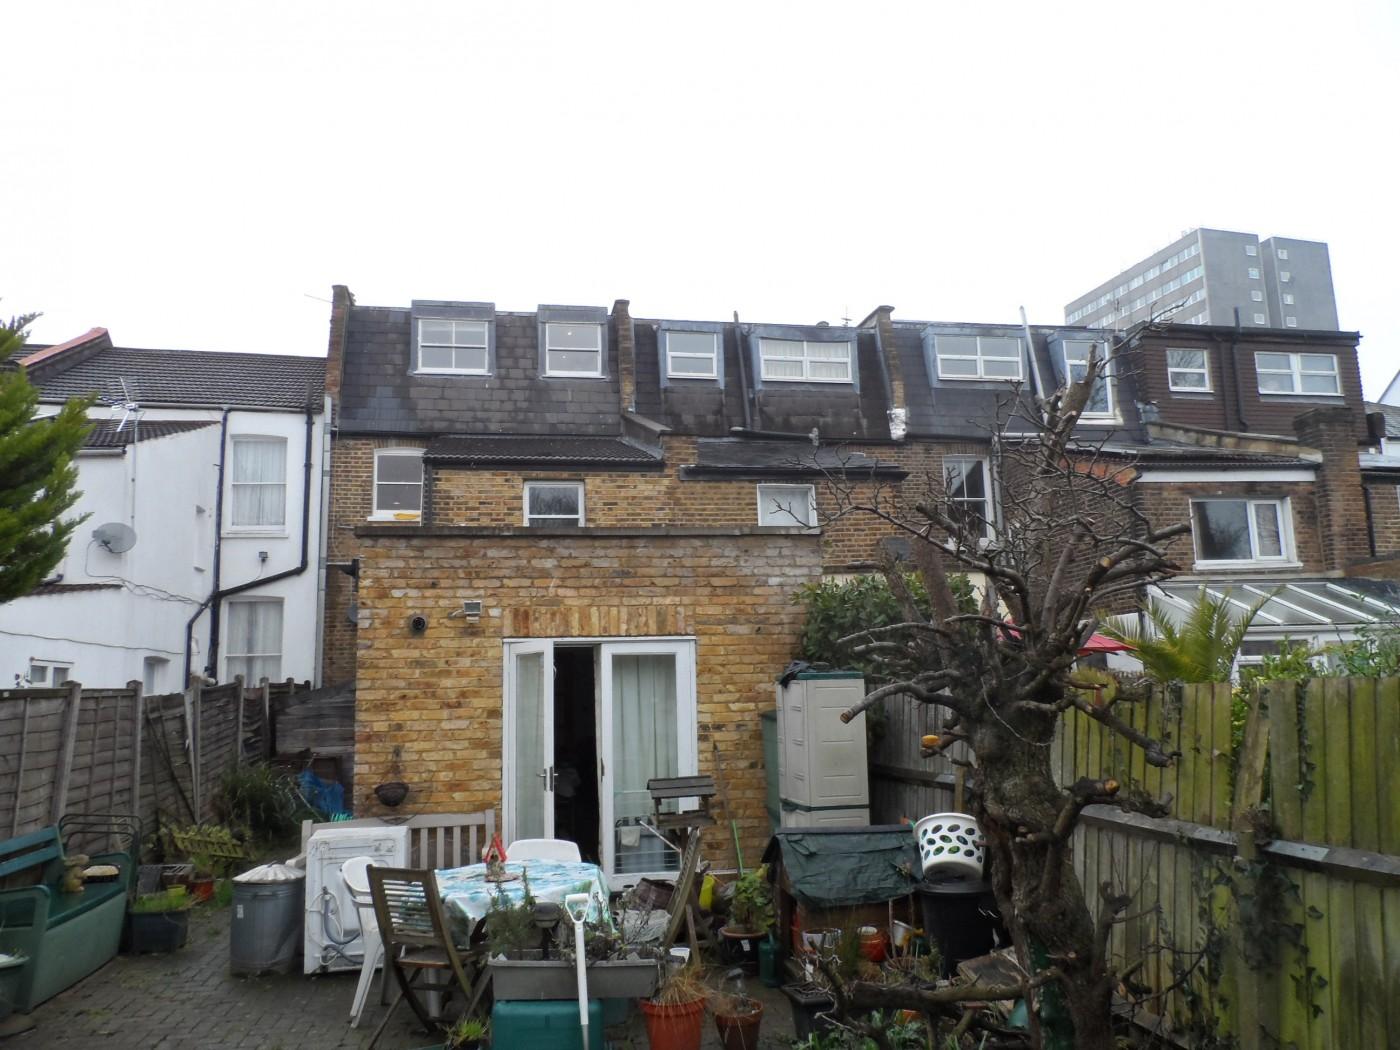 Retrospective Permission For Roof Terrace Islington